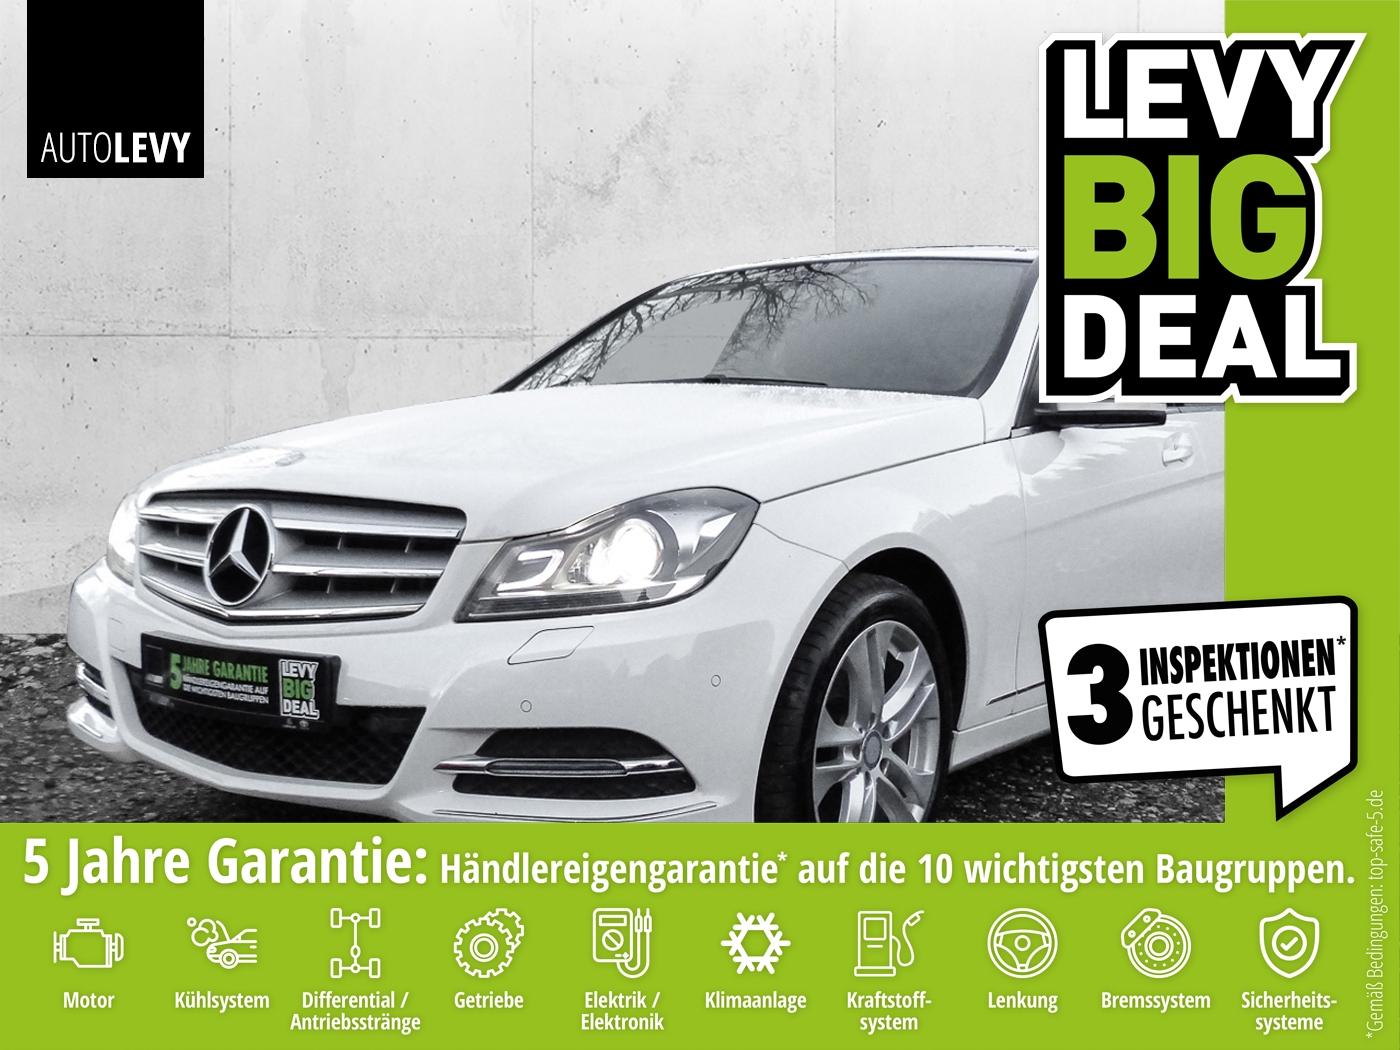 Mercedes-Benz C180 AVANTGARDE BE Bi-Xenon ILS*Navi*WKR*PDC, Jahr 2013, Benzin